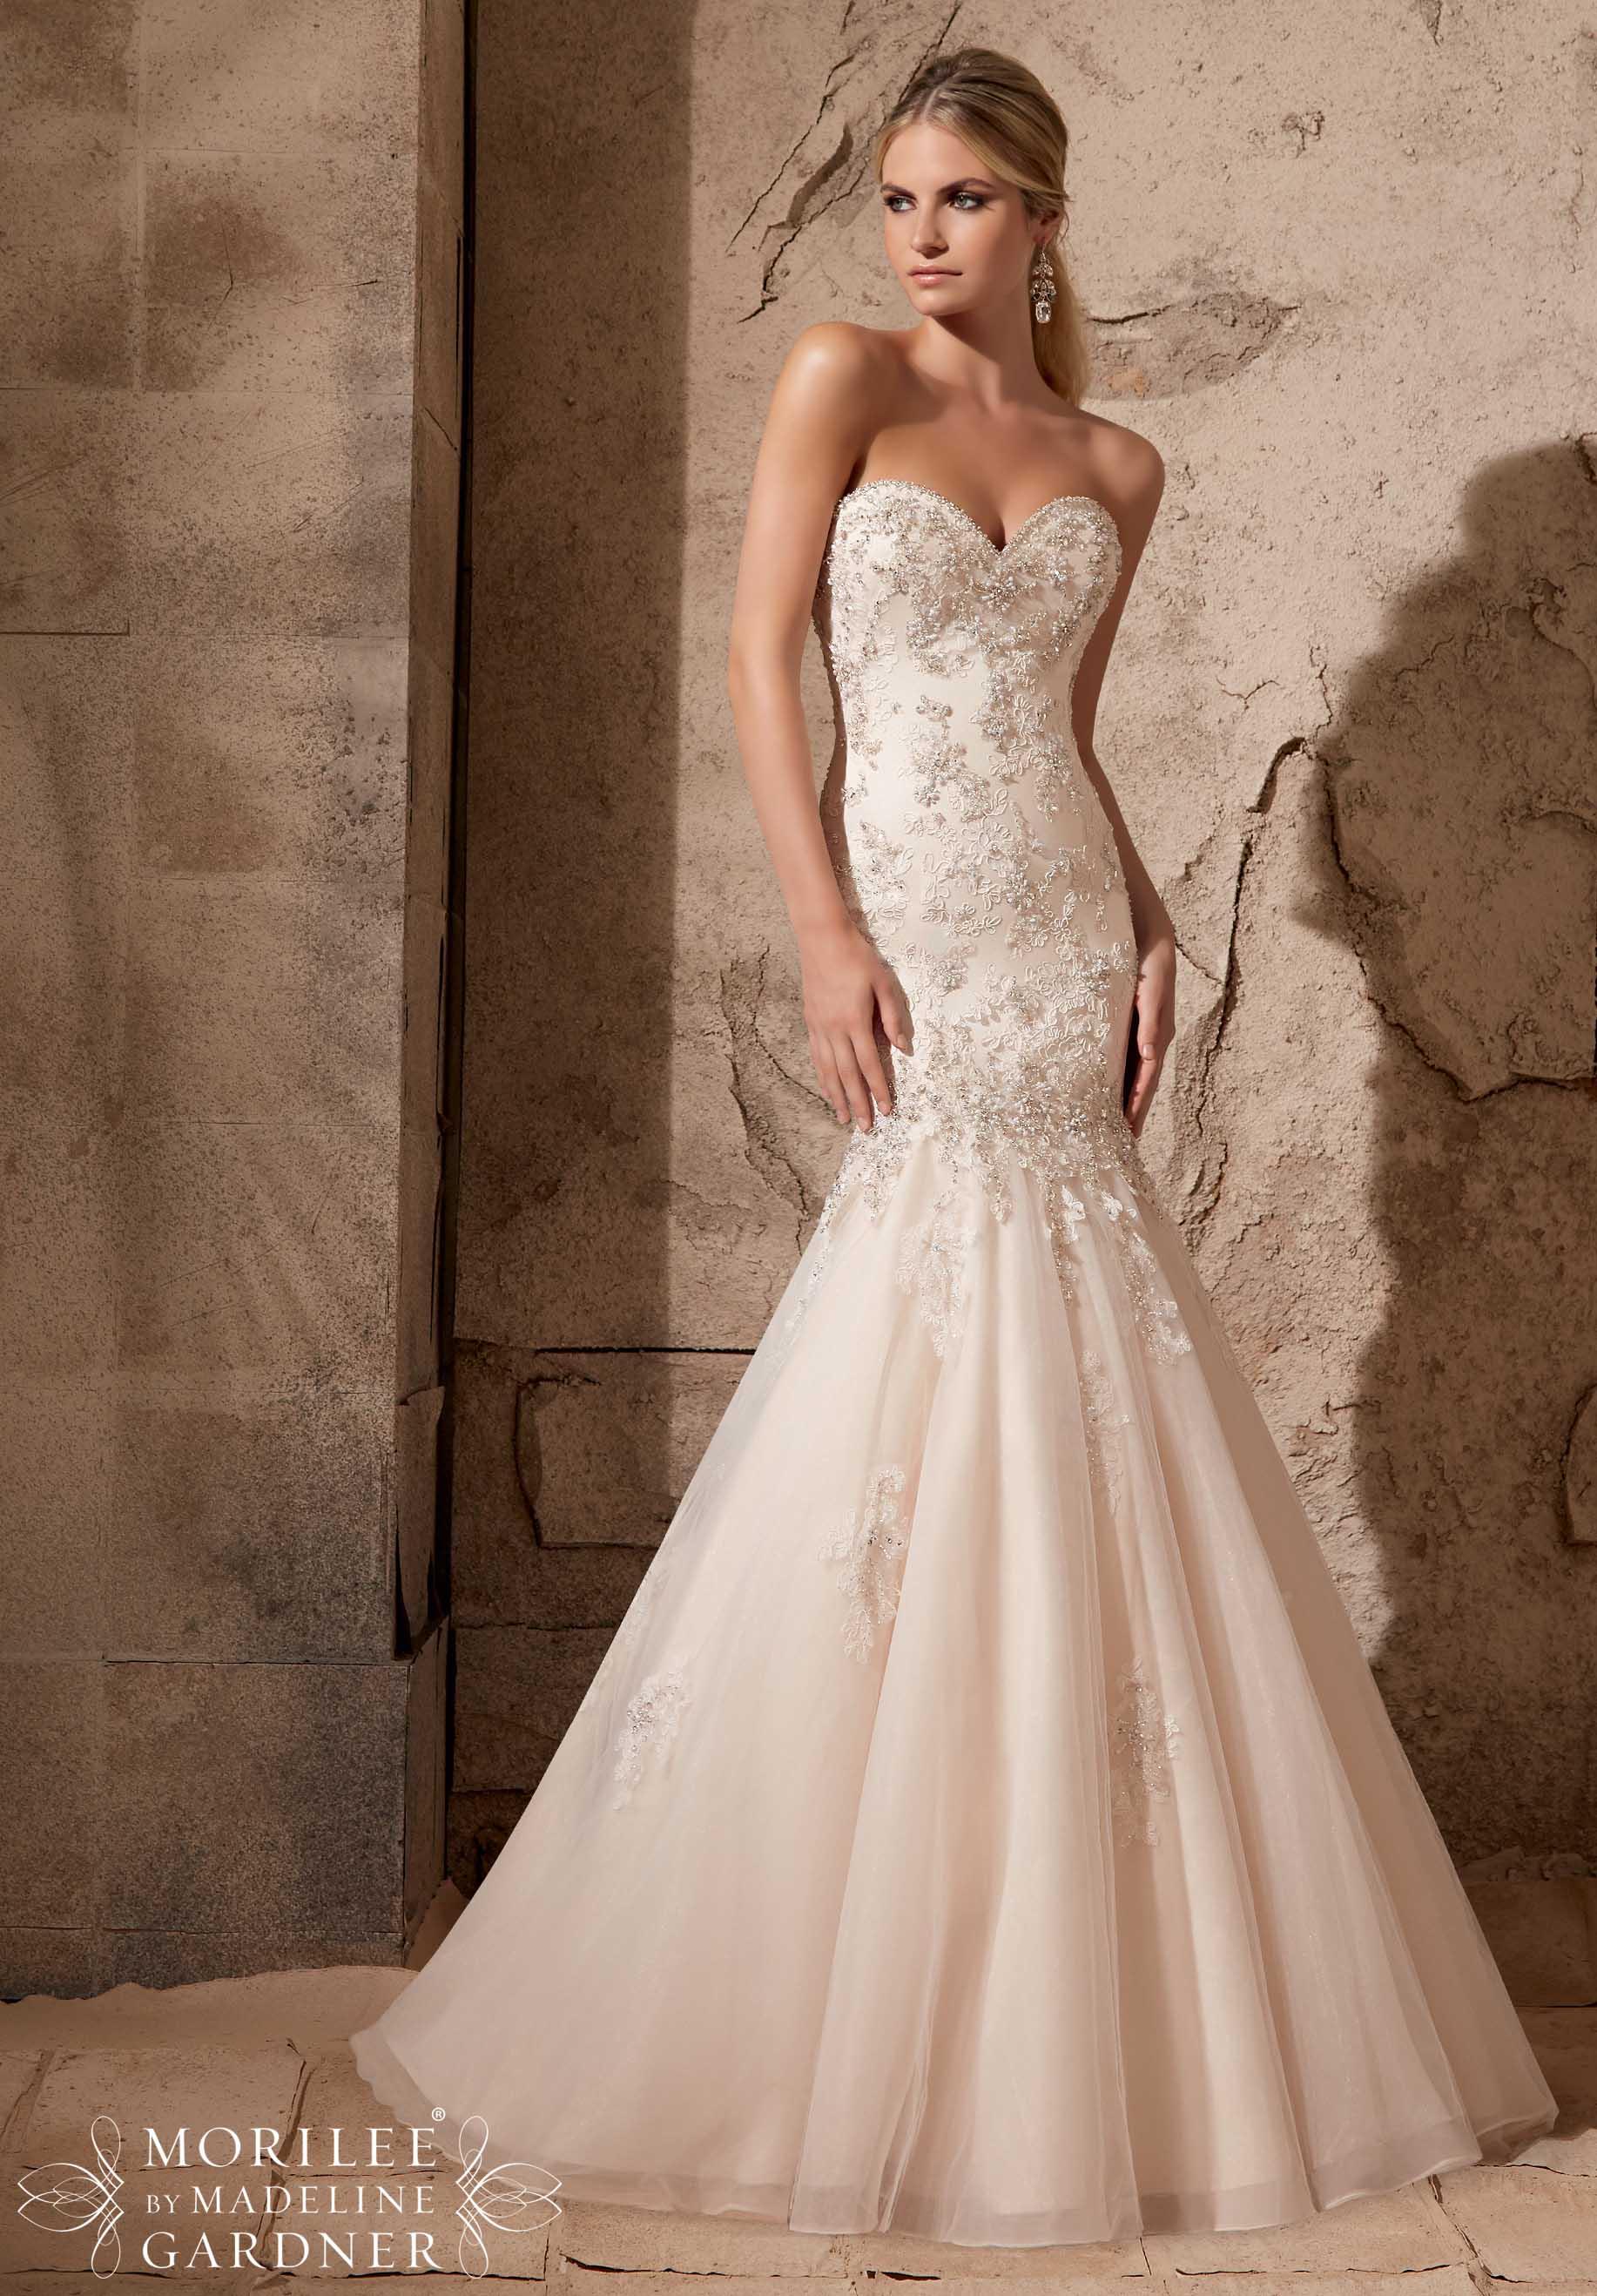 Dress Mori Lee Bridal SPRING 2015 Collection 2720